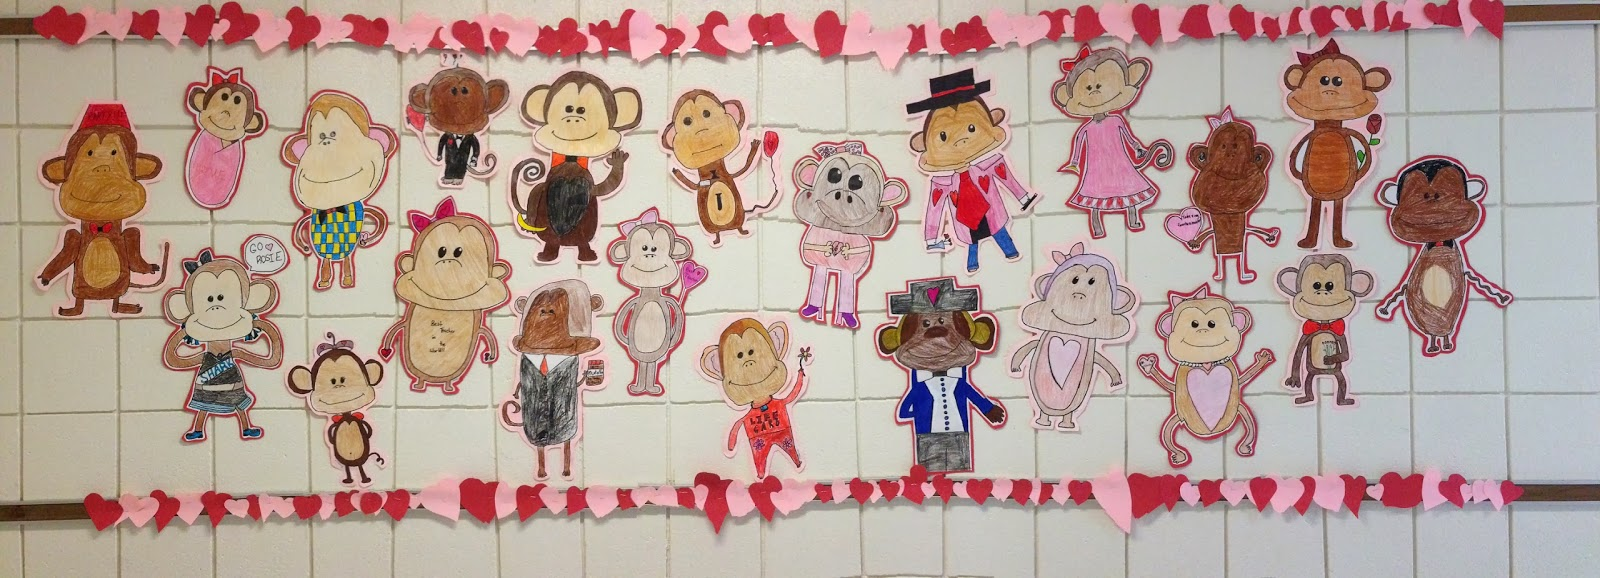 Draw Monkey Art Kids Hub